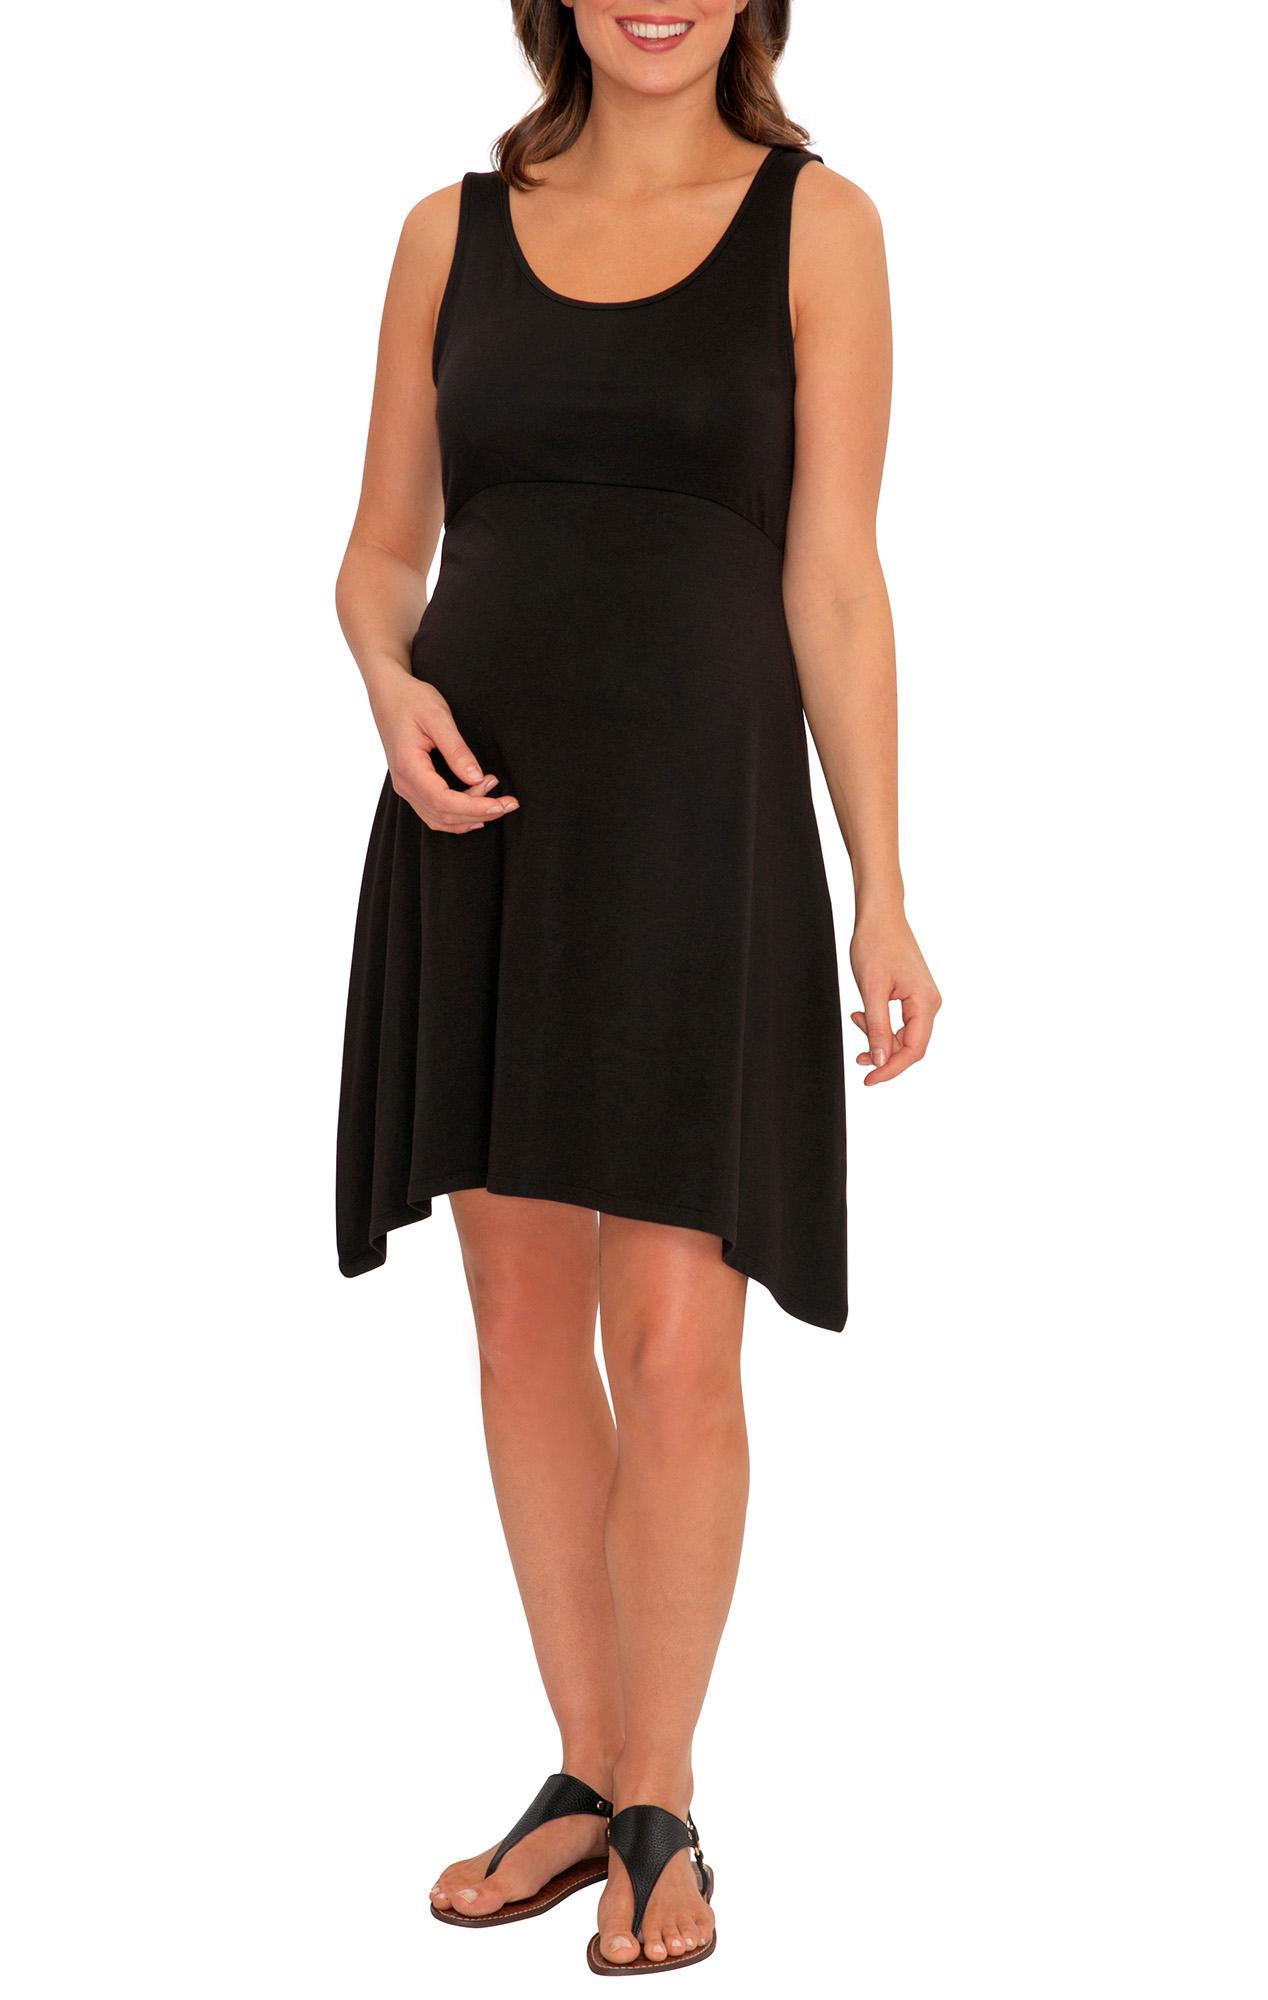 Great Expectations Maternity Handkerchief Hem Tank Top Dress Walmart Com Walmart Com